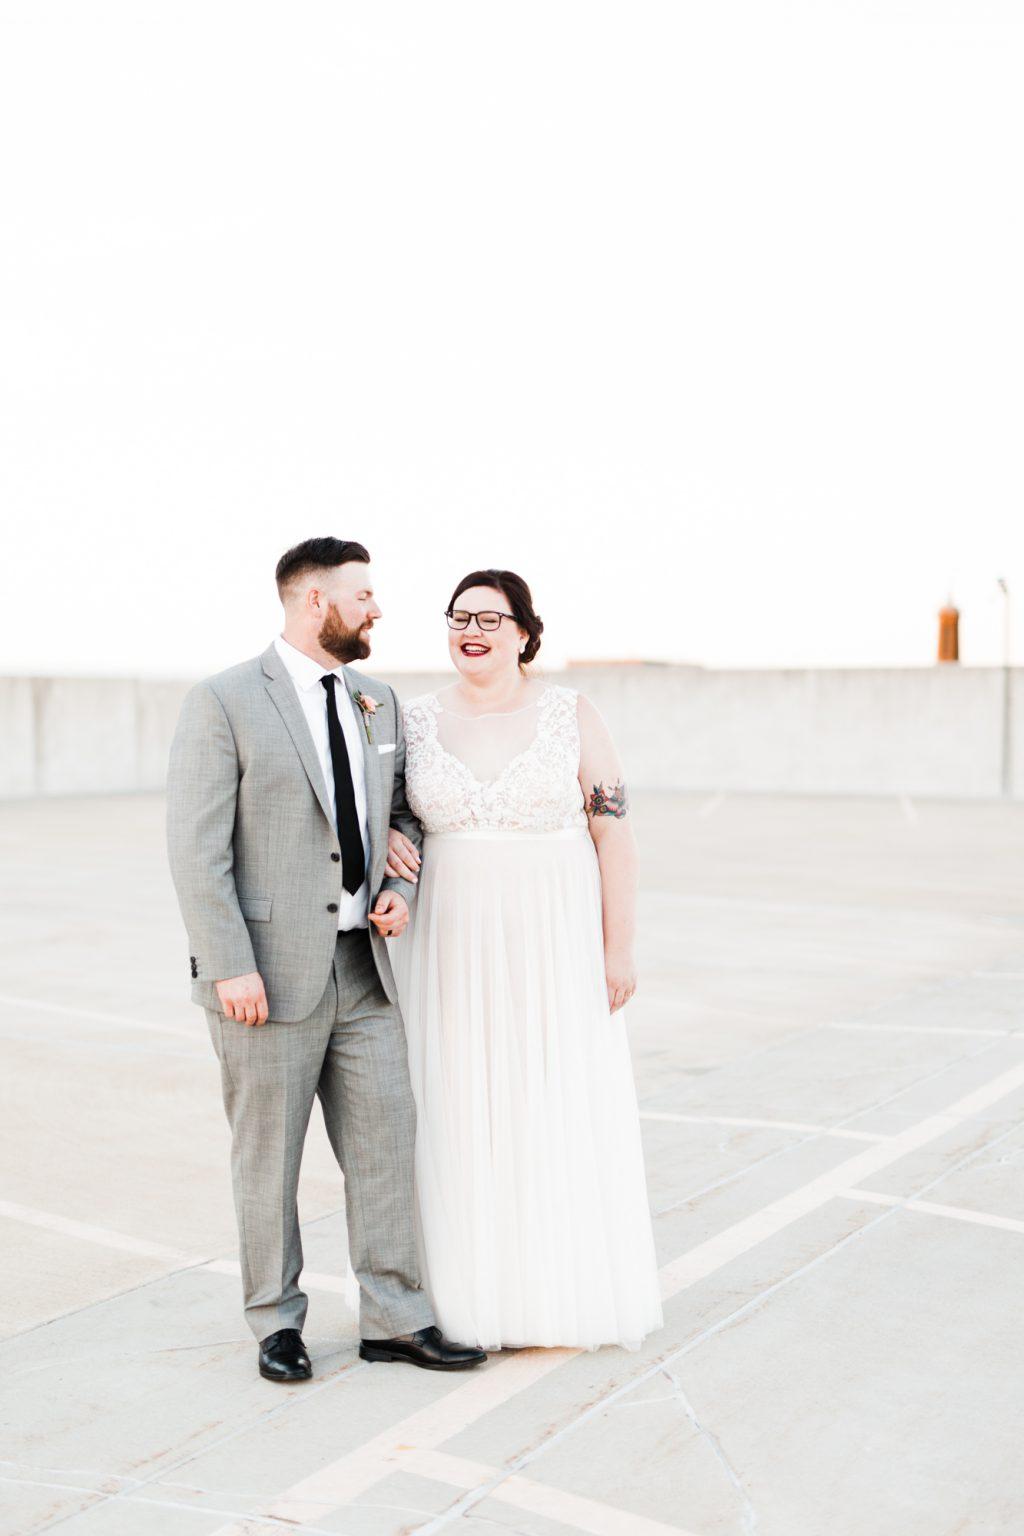 haley-richter-photo-west-chester-summer-wedding-boxcar-brewery-184